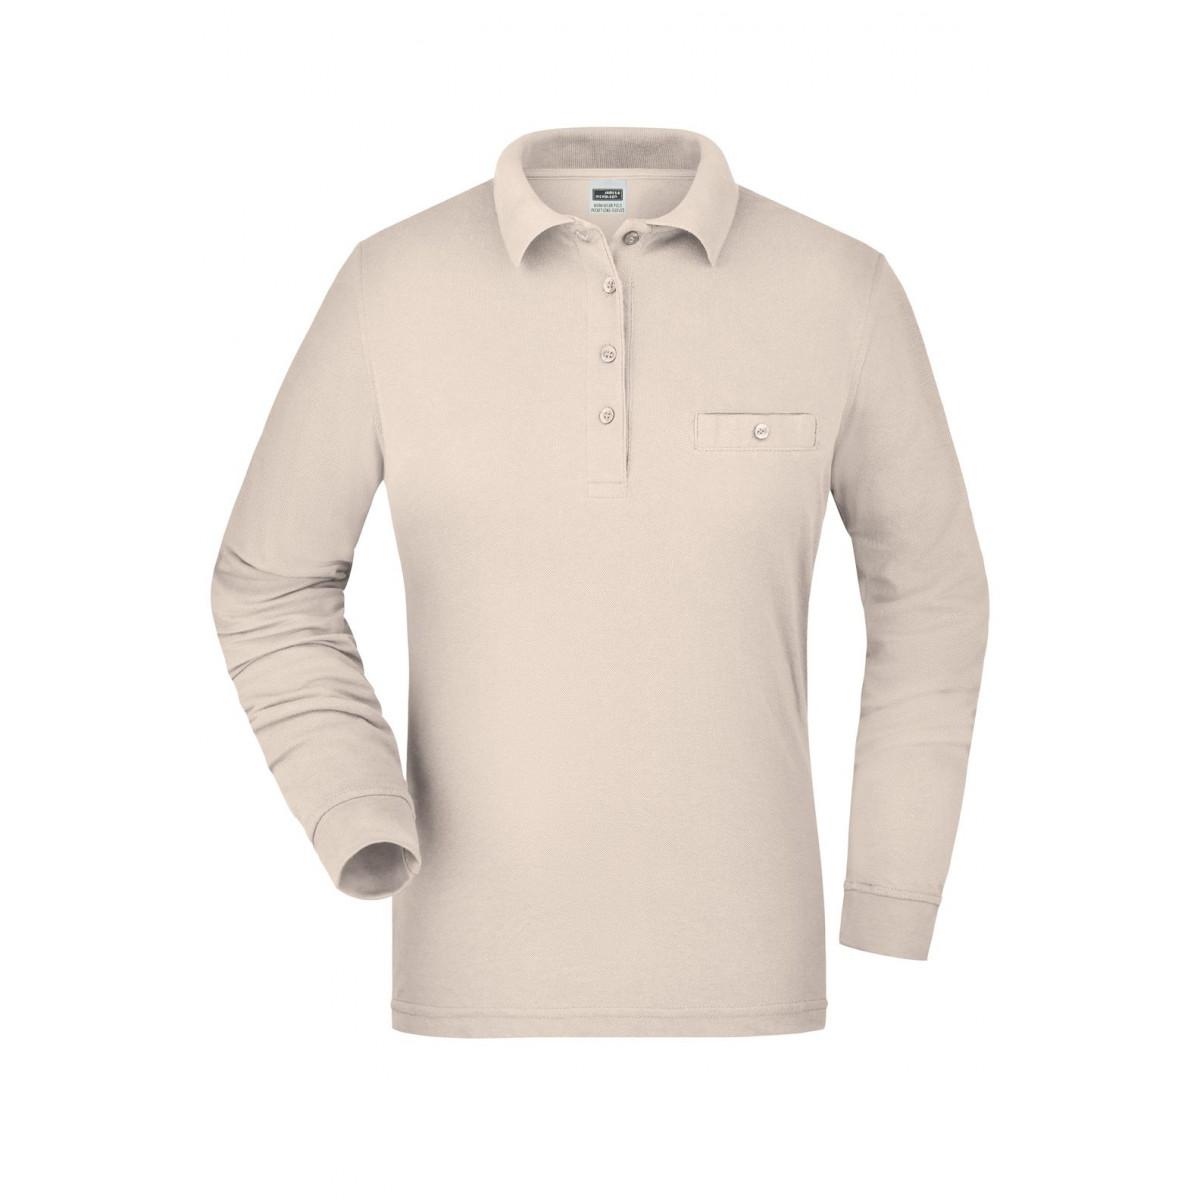 Рубашка поло женская JN865 Ladies Workwear Polo Pocket Longsleeve - Бежевый